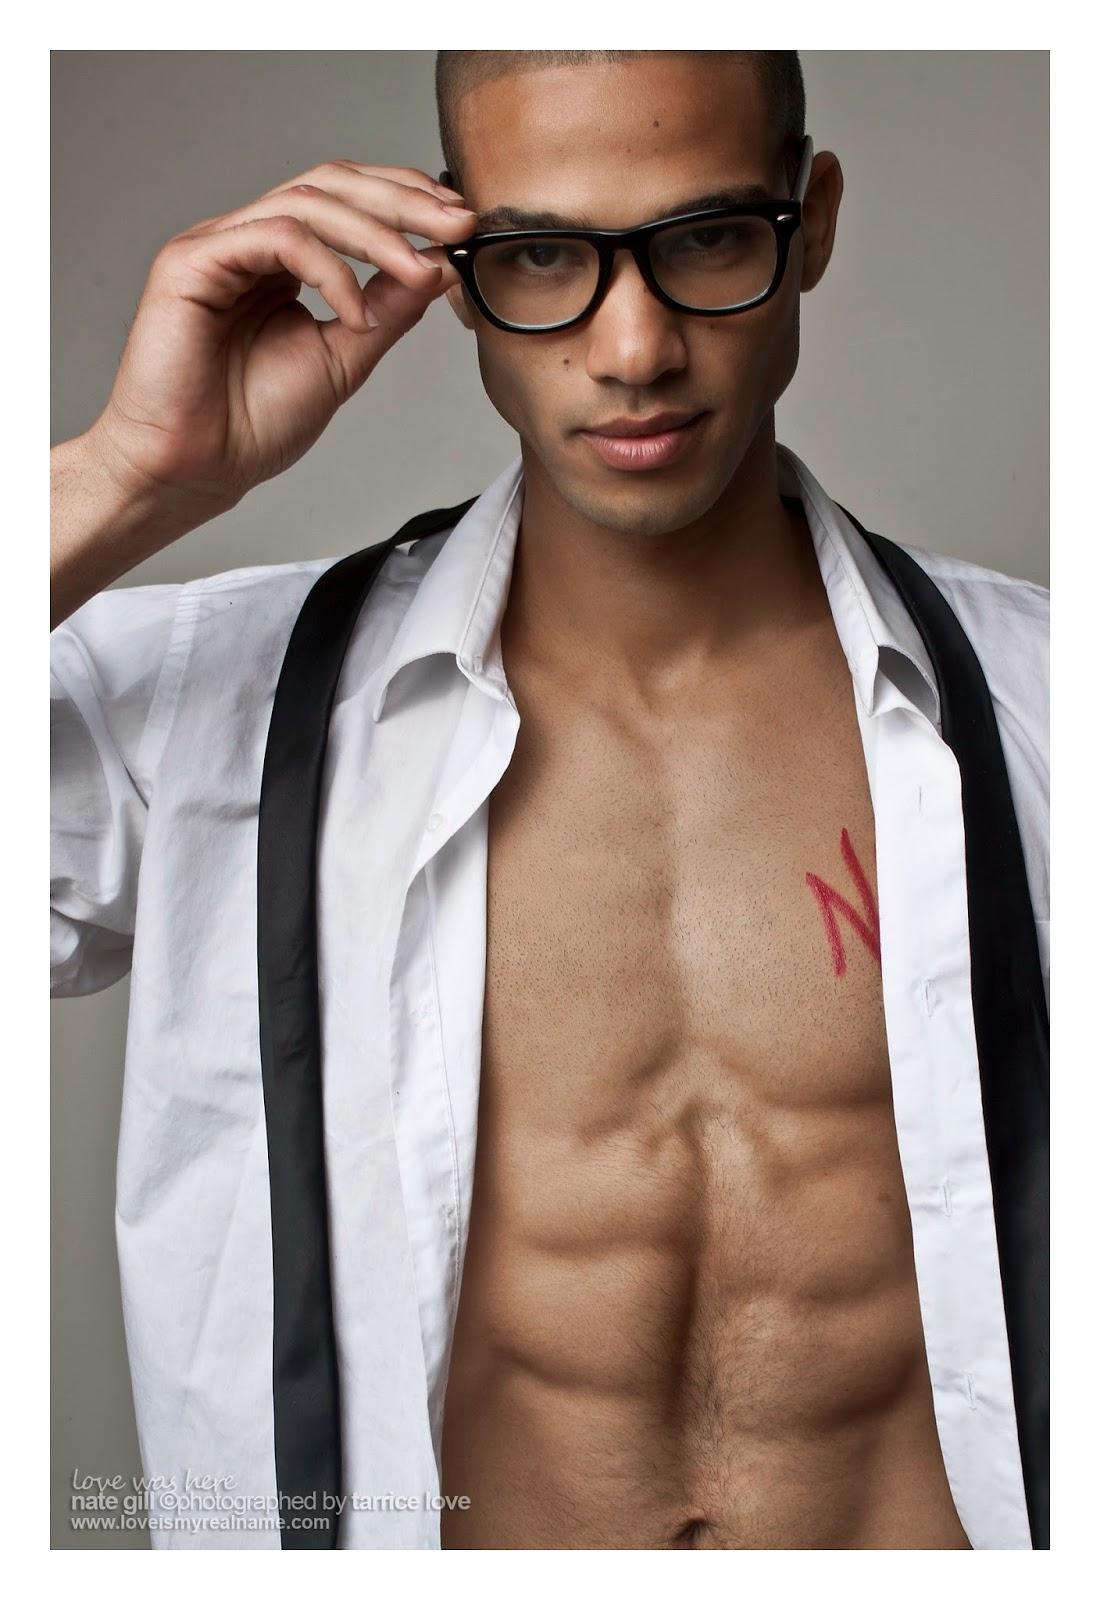 Nate Gill - Fashion Model - Profile on New York Magazine